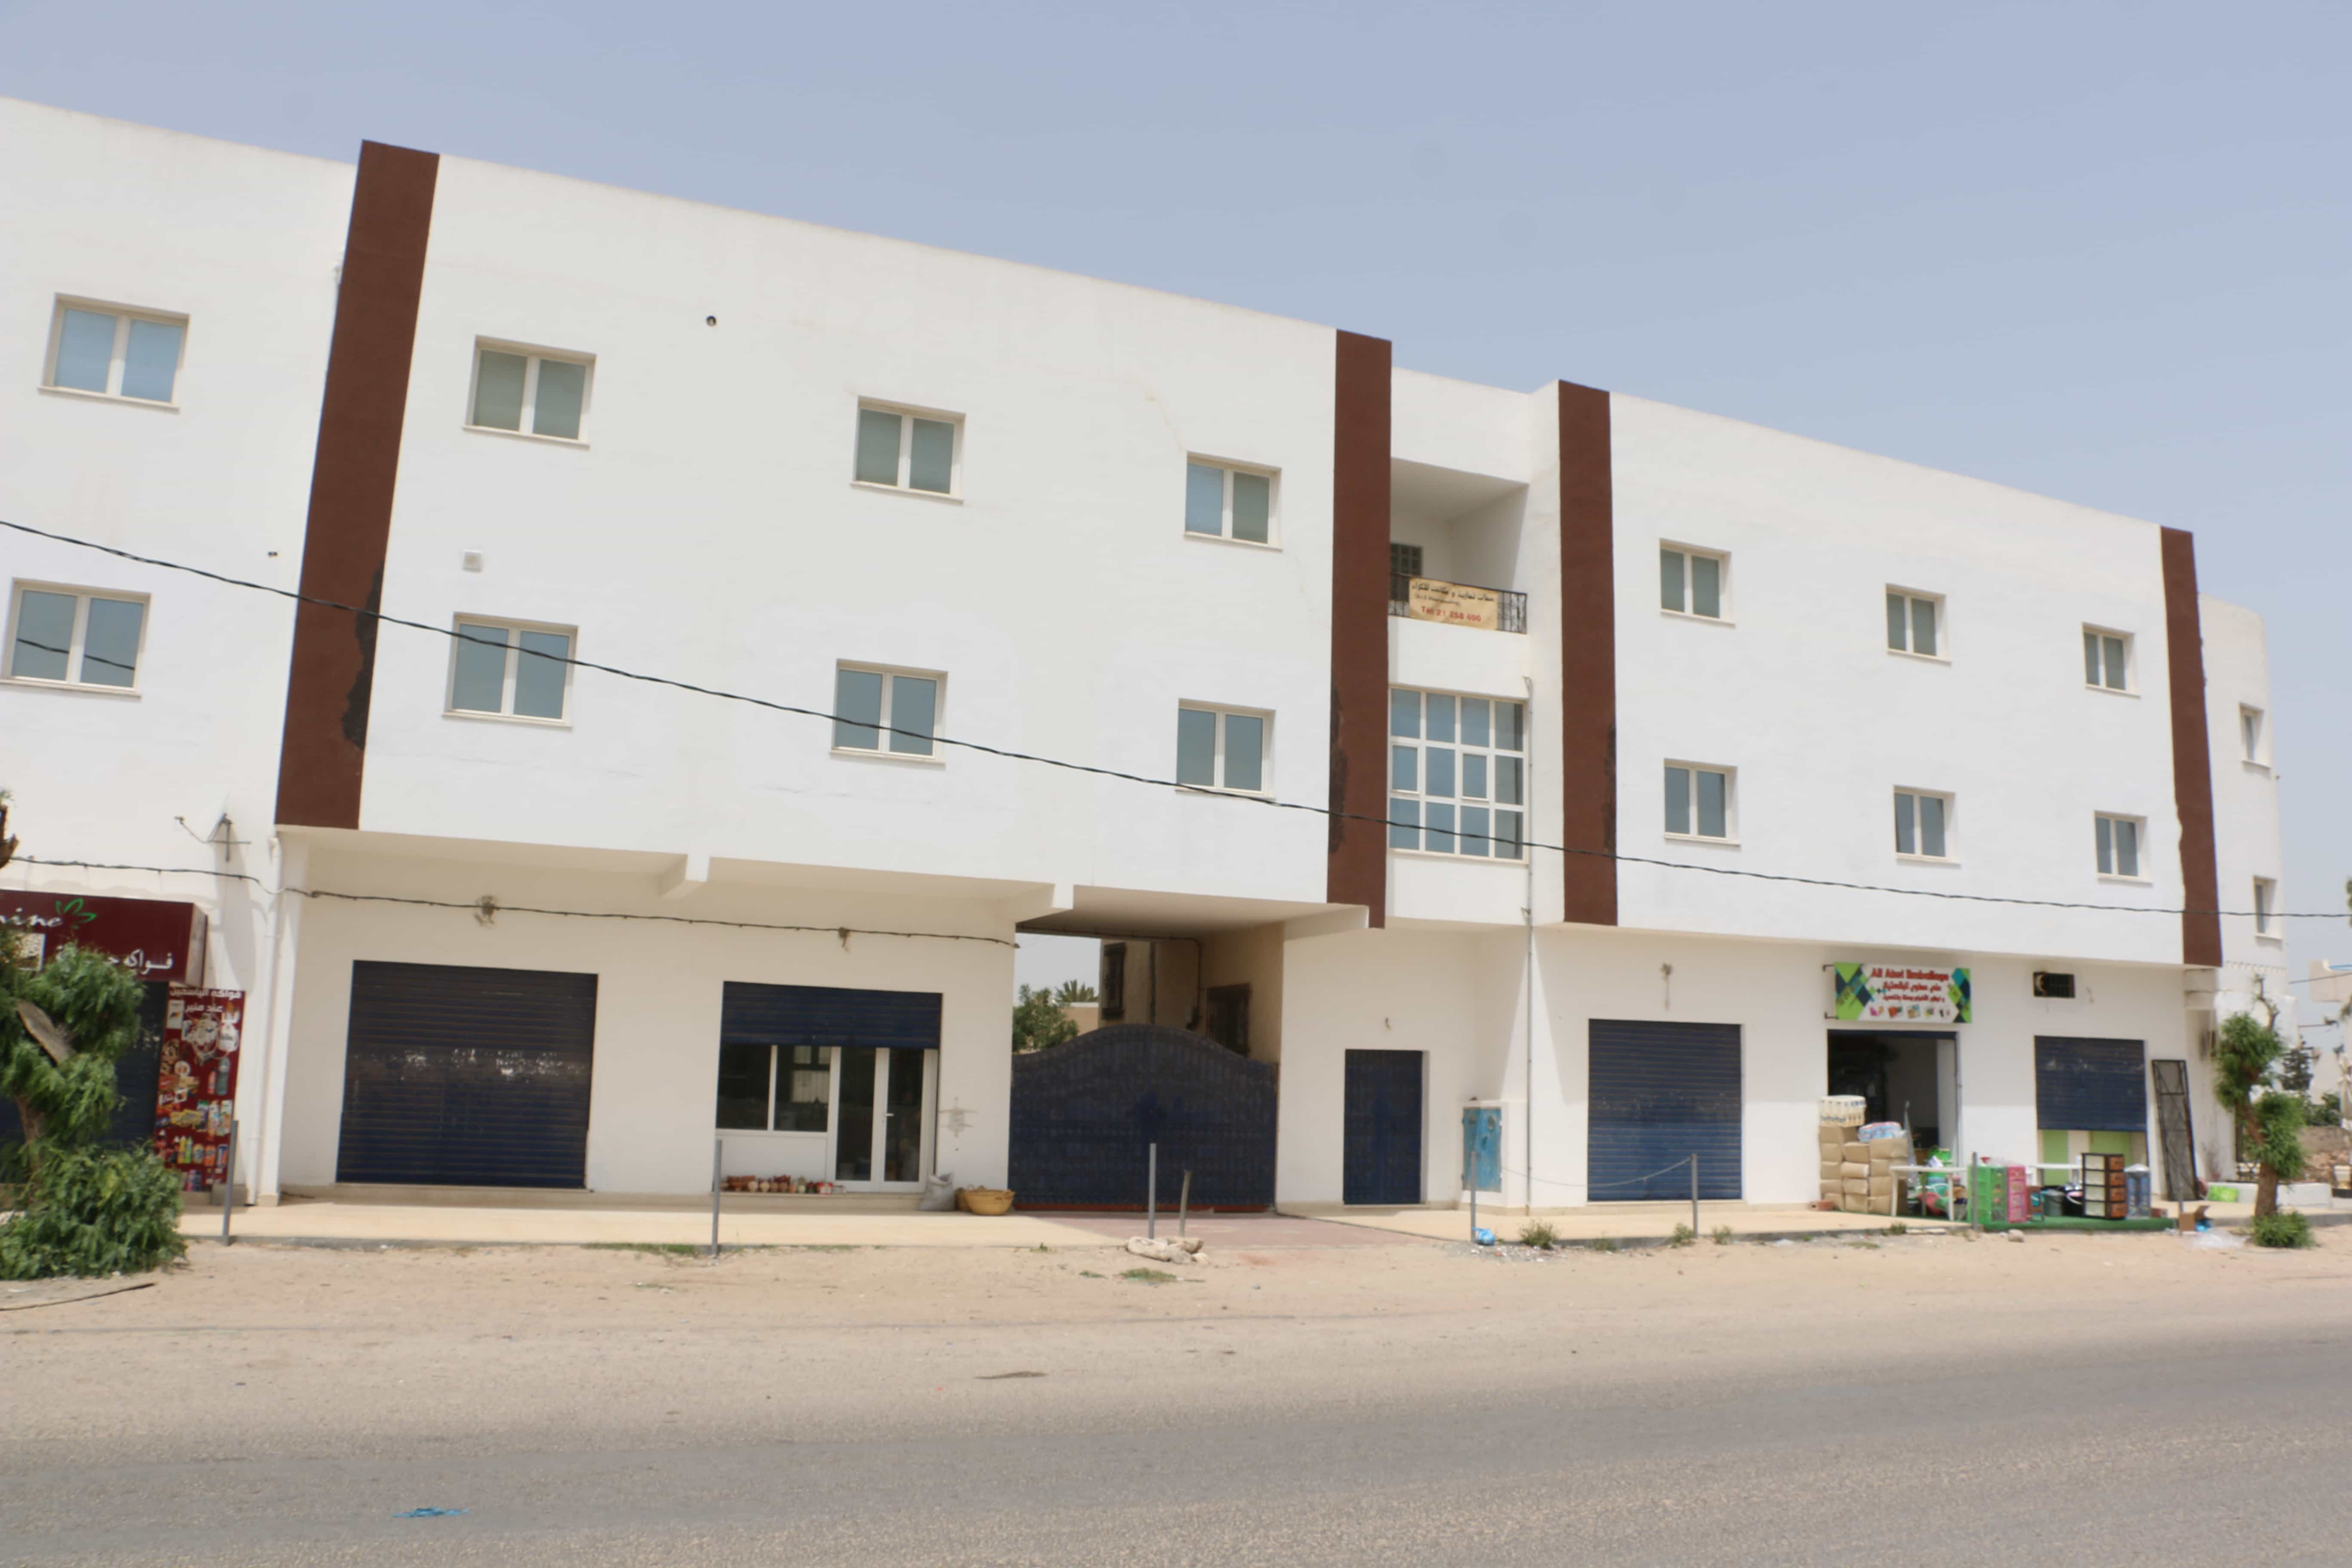 6 dépôts de stockage à Djerba Midoun